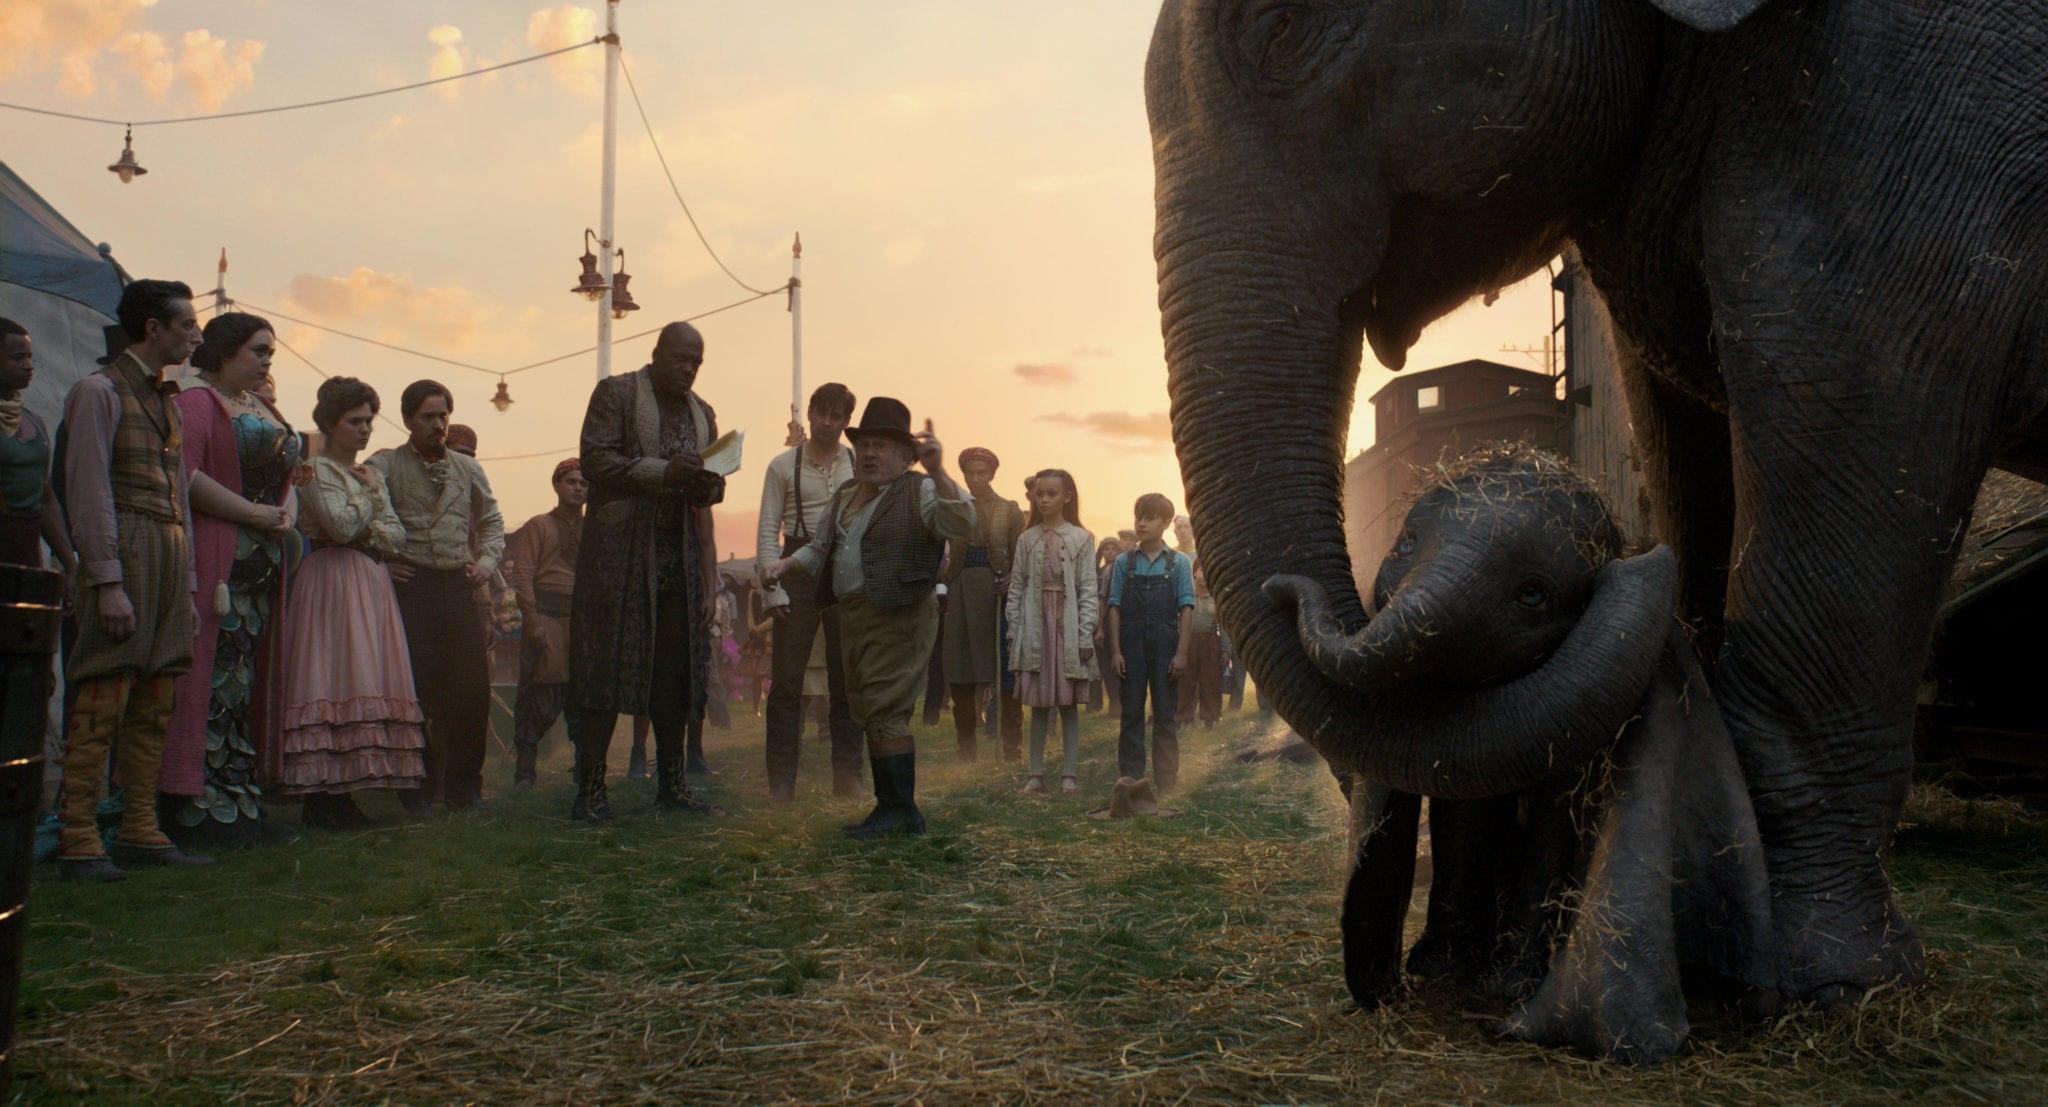 Dumbo3 - KINOFILME AB 28.03.2019